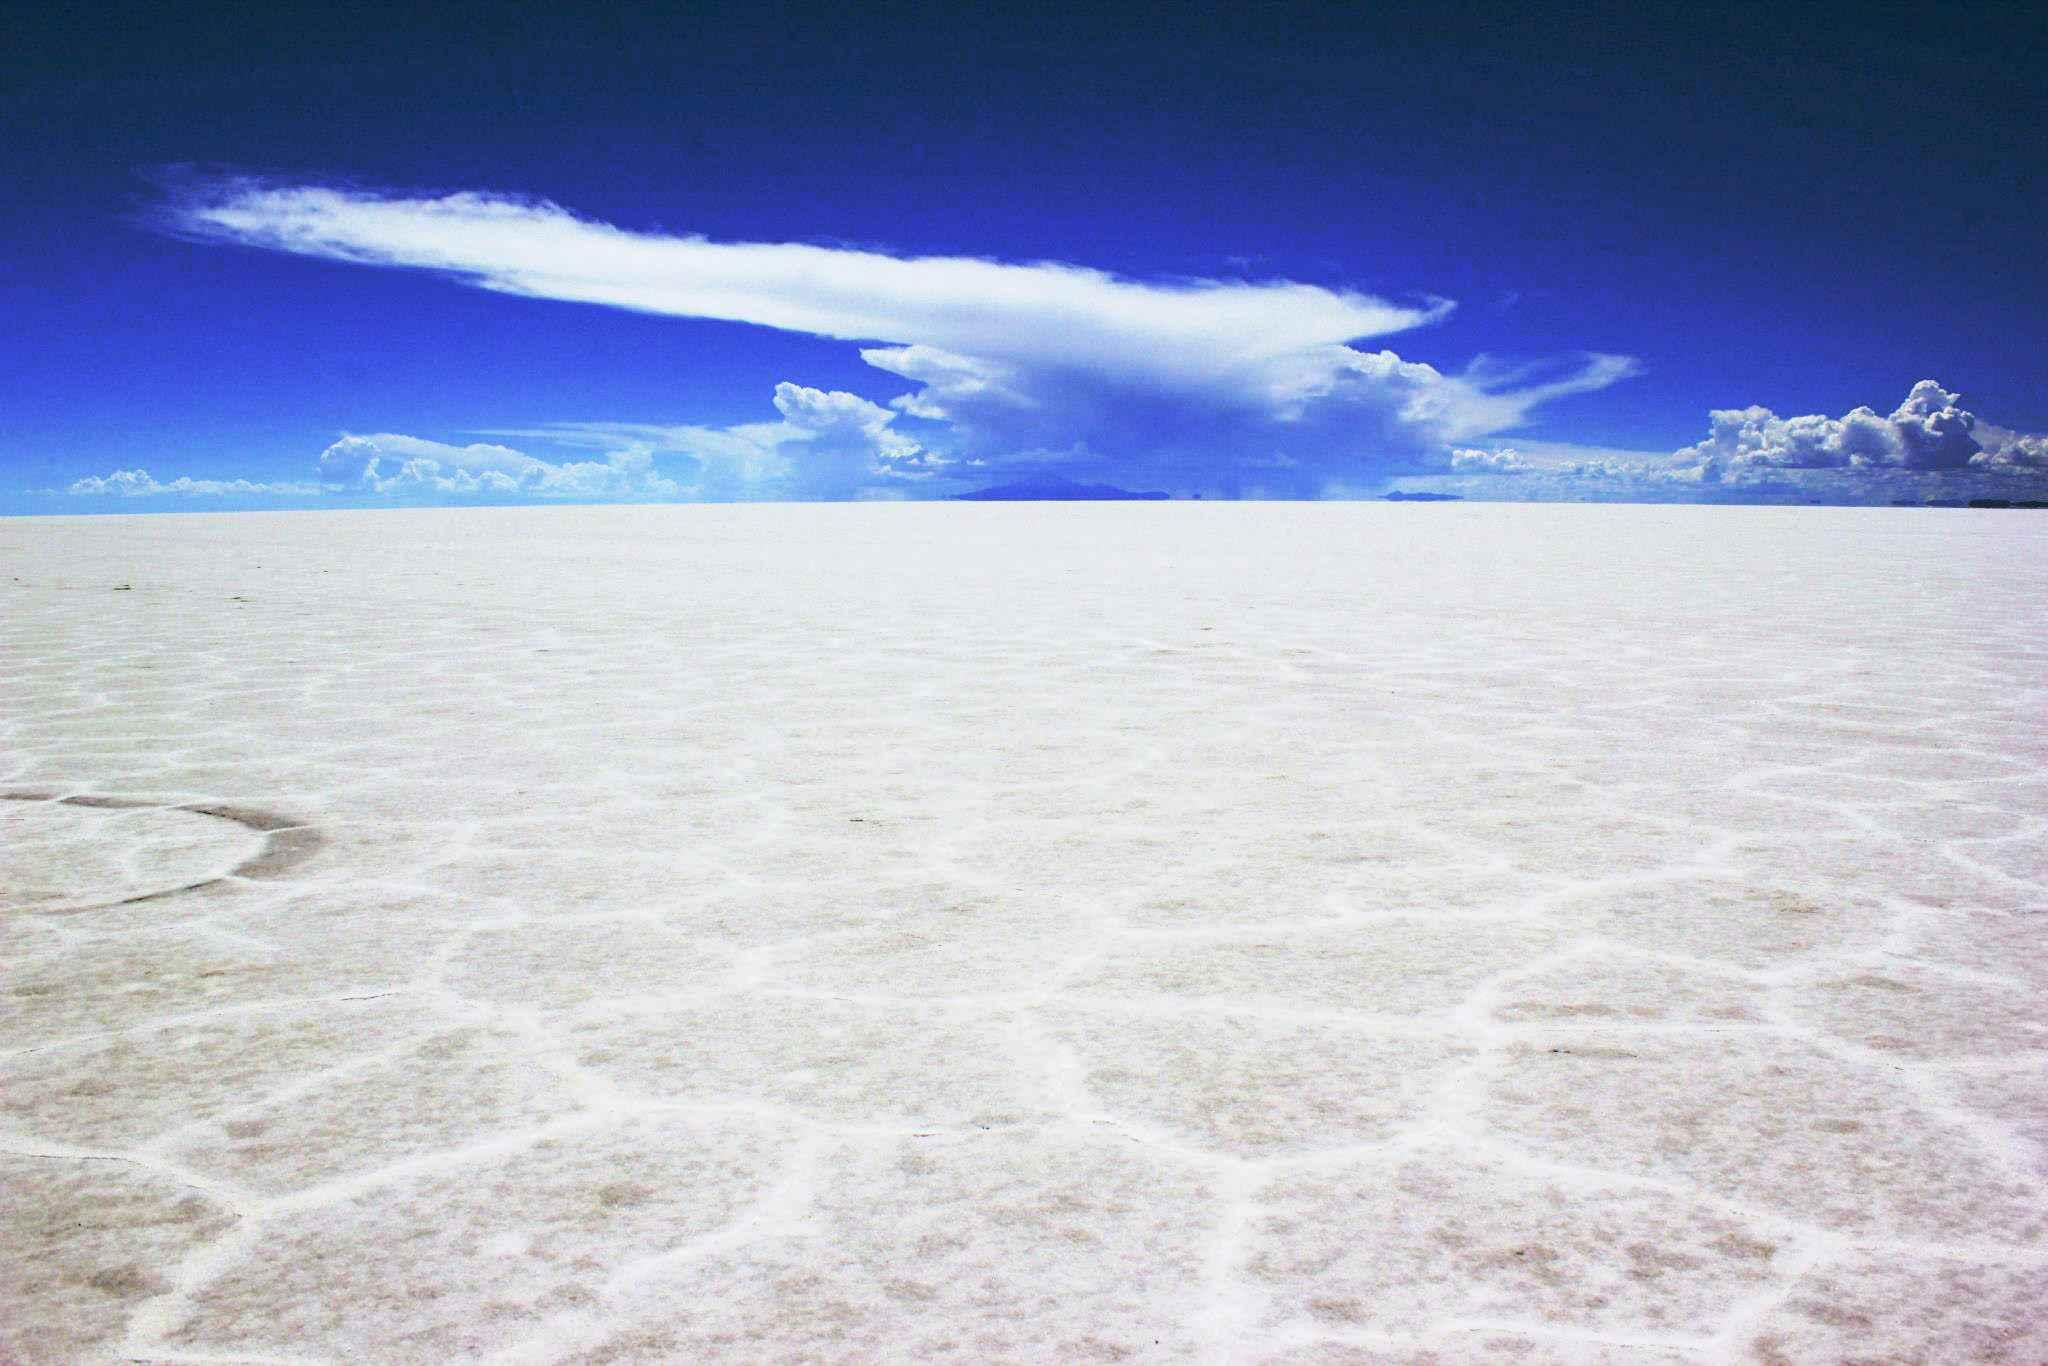 View of the Uyuni Salt flats